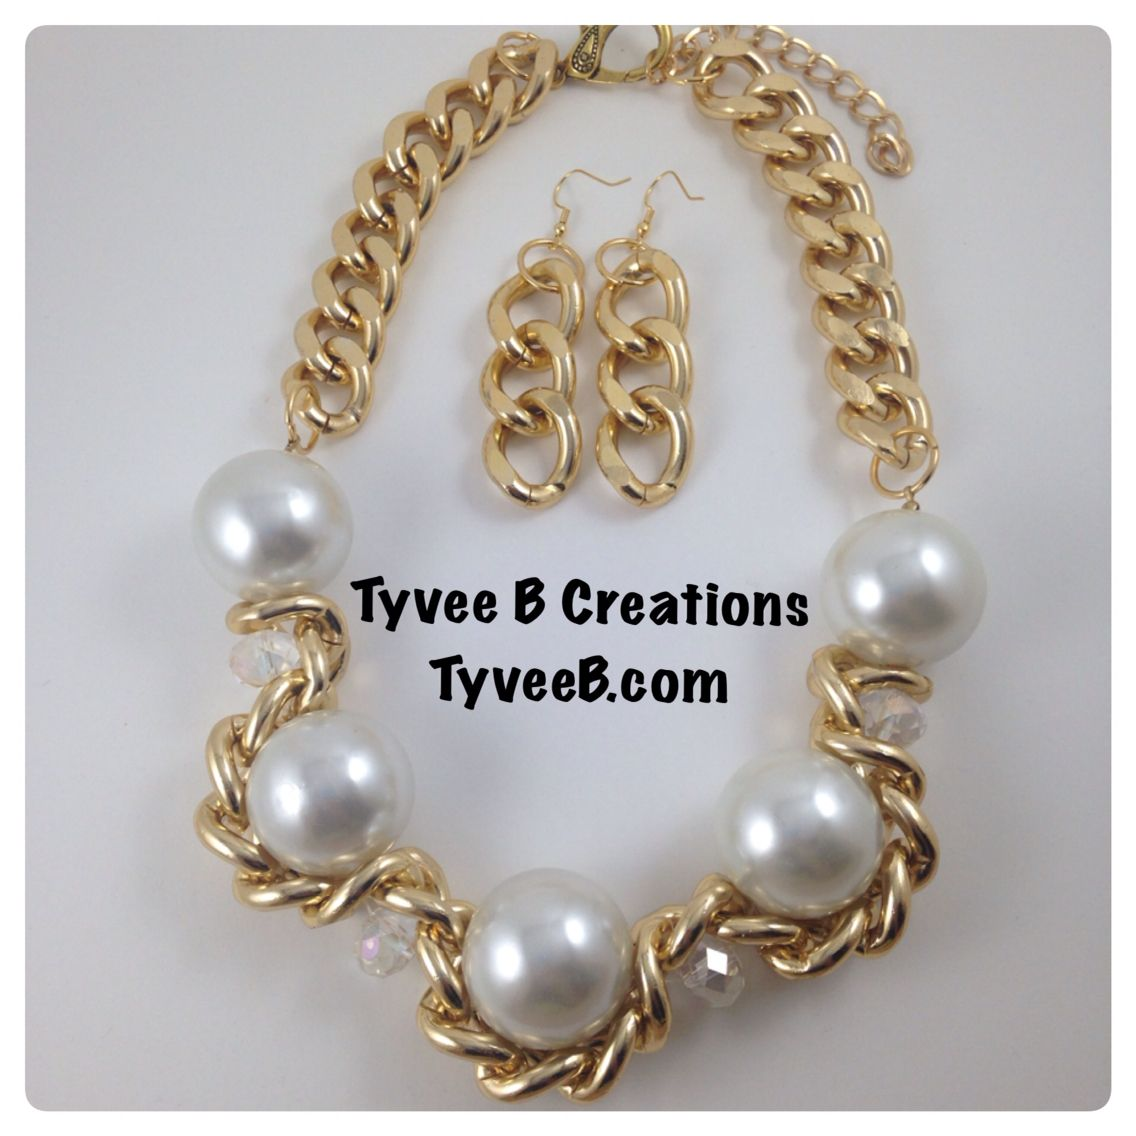 Handmade statement necklace. Tyveeb.com